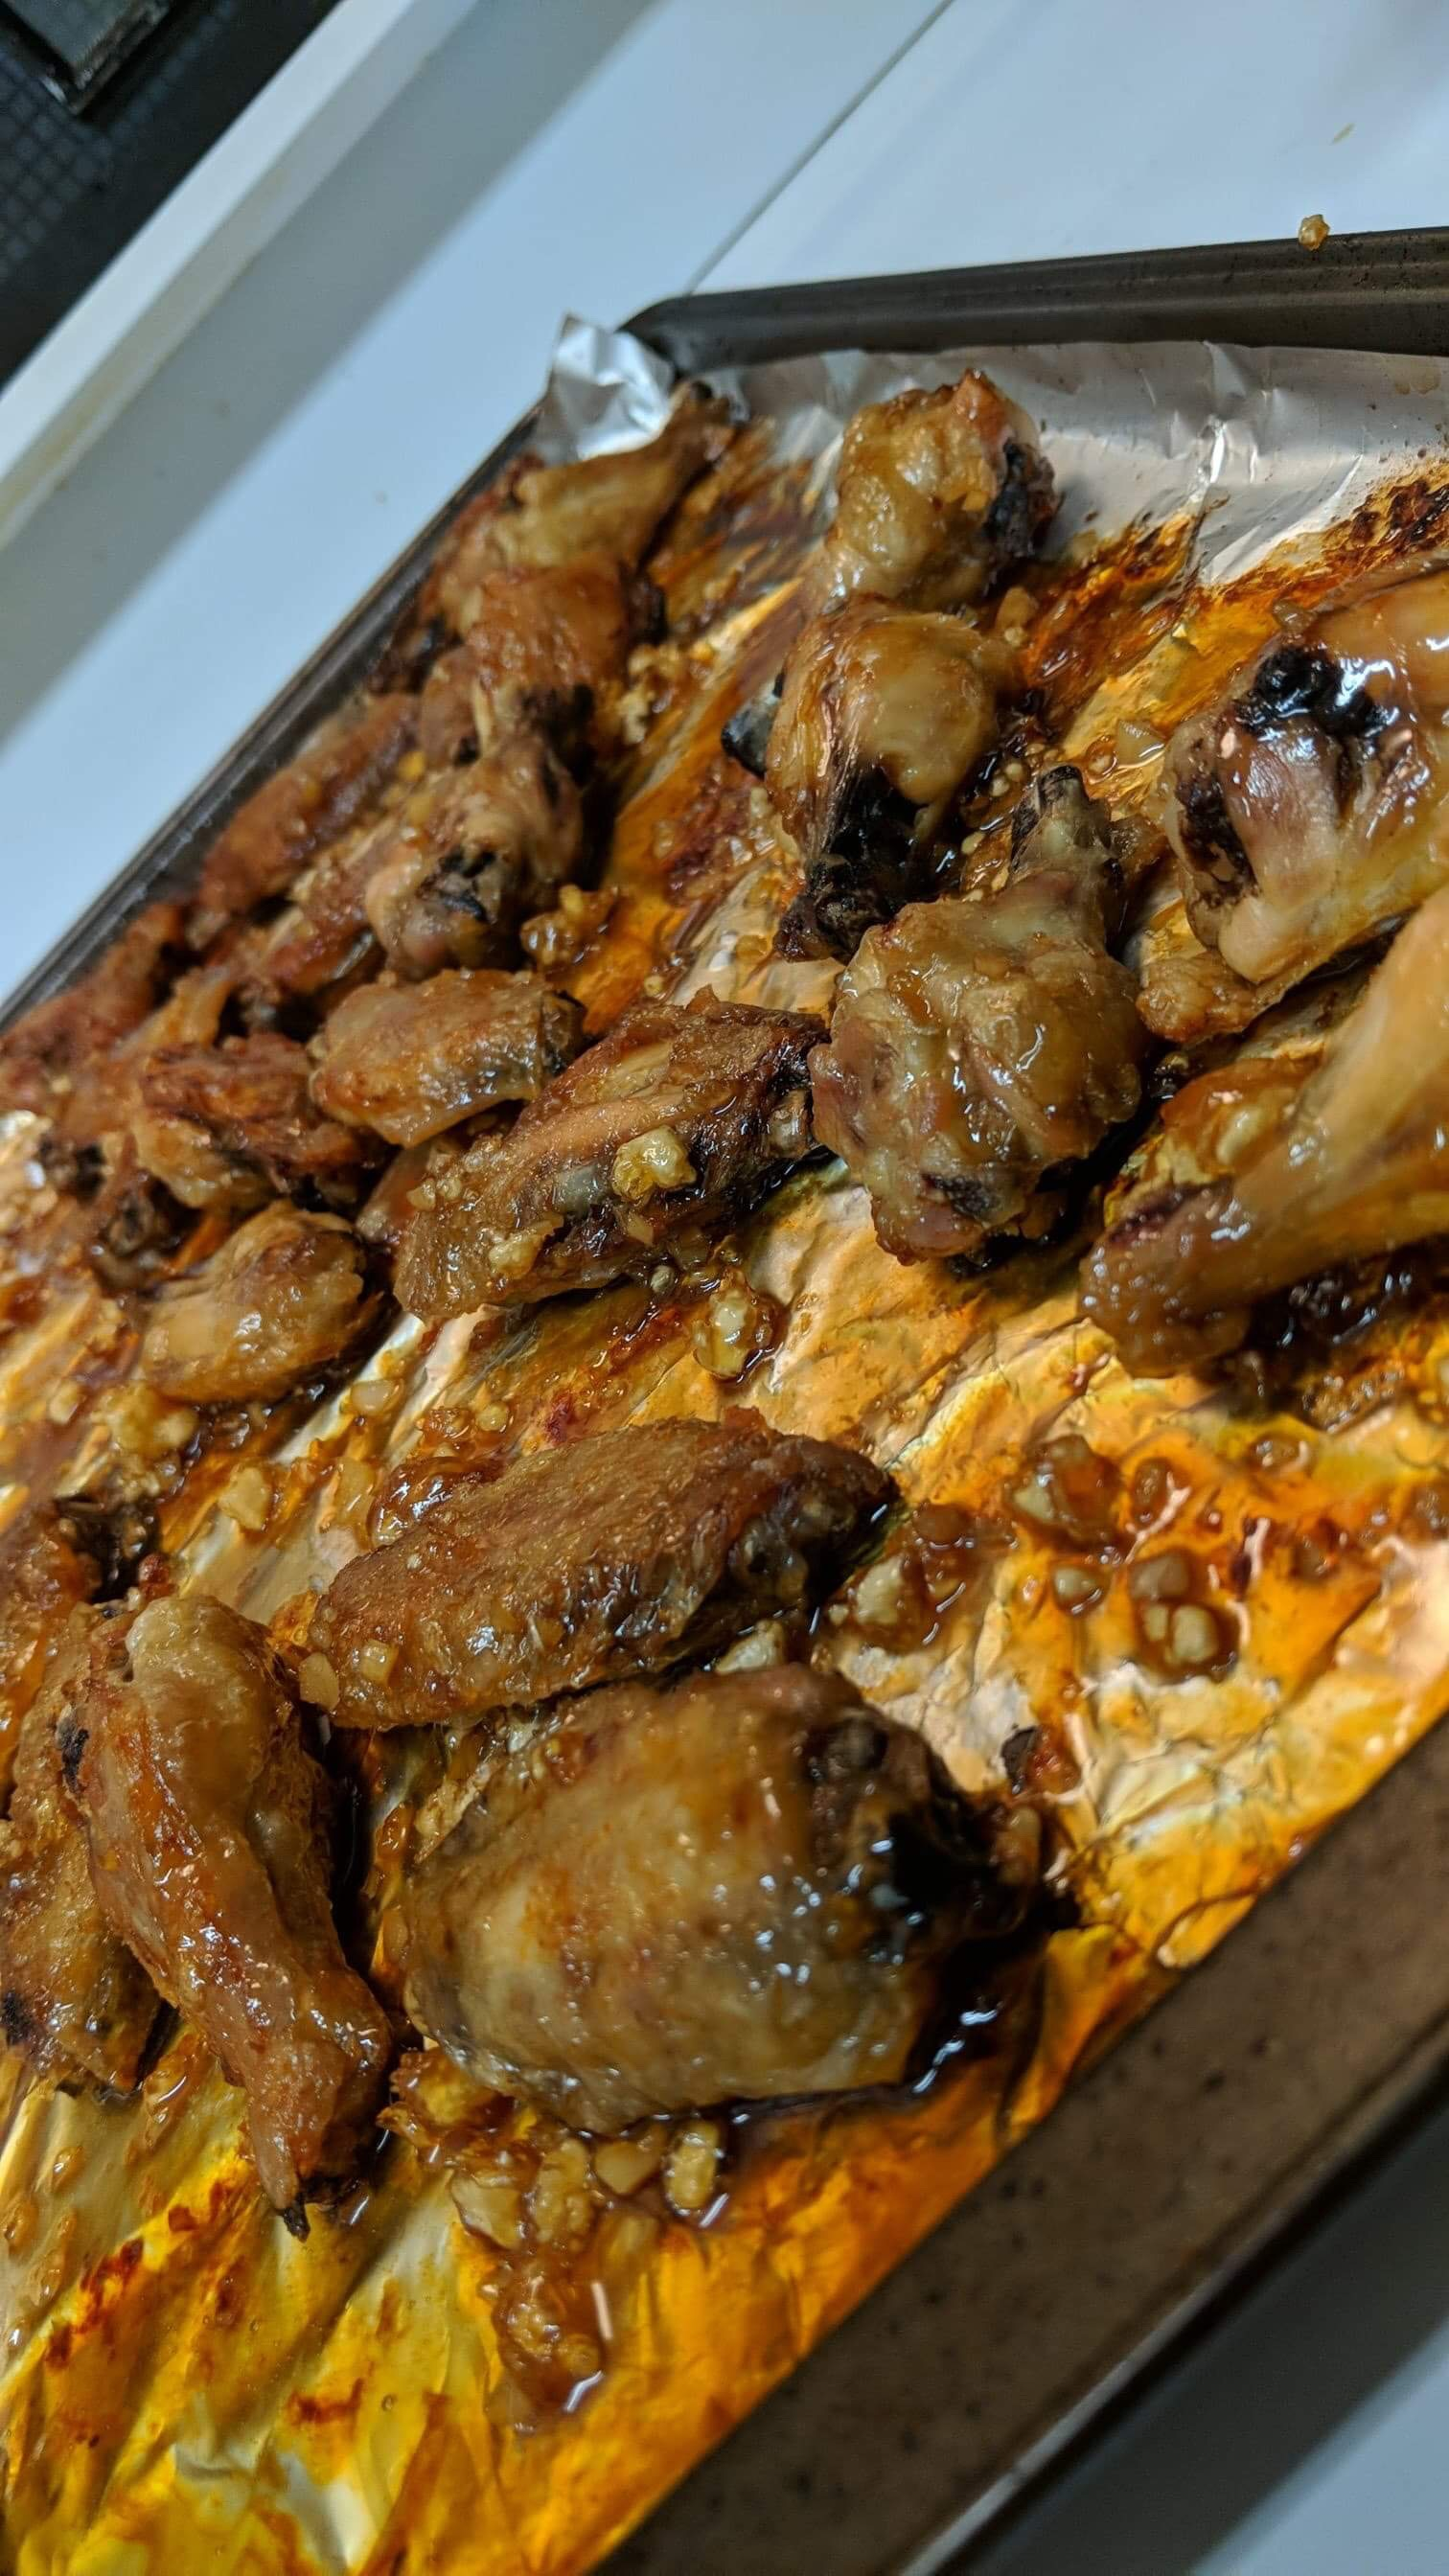 Krista's Sticky Honey Garlic Wings